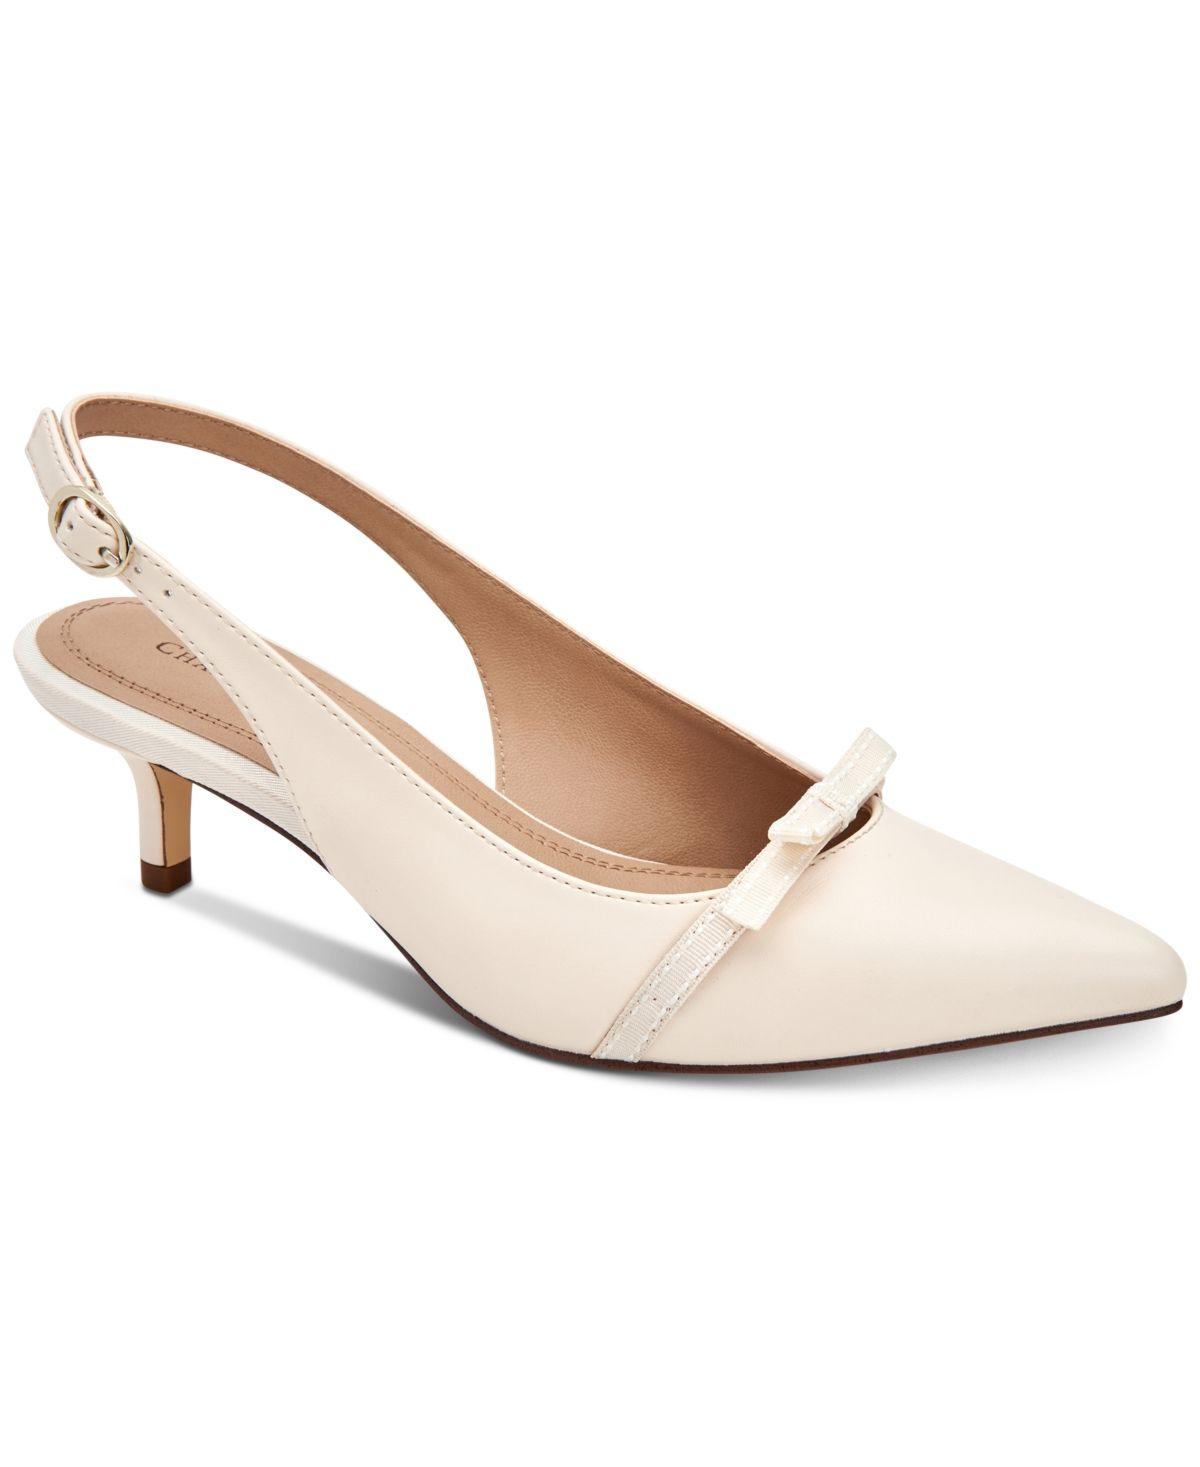 Charter Club Gilaa Heels Created For Macy S Reviews Heels Pumps Shoes Macy S Kitten Heel Shoes Heels Pump Shoes